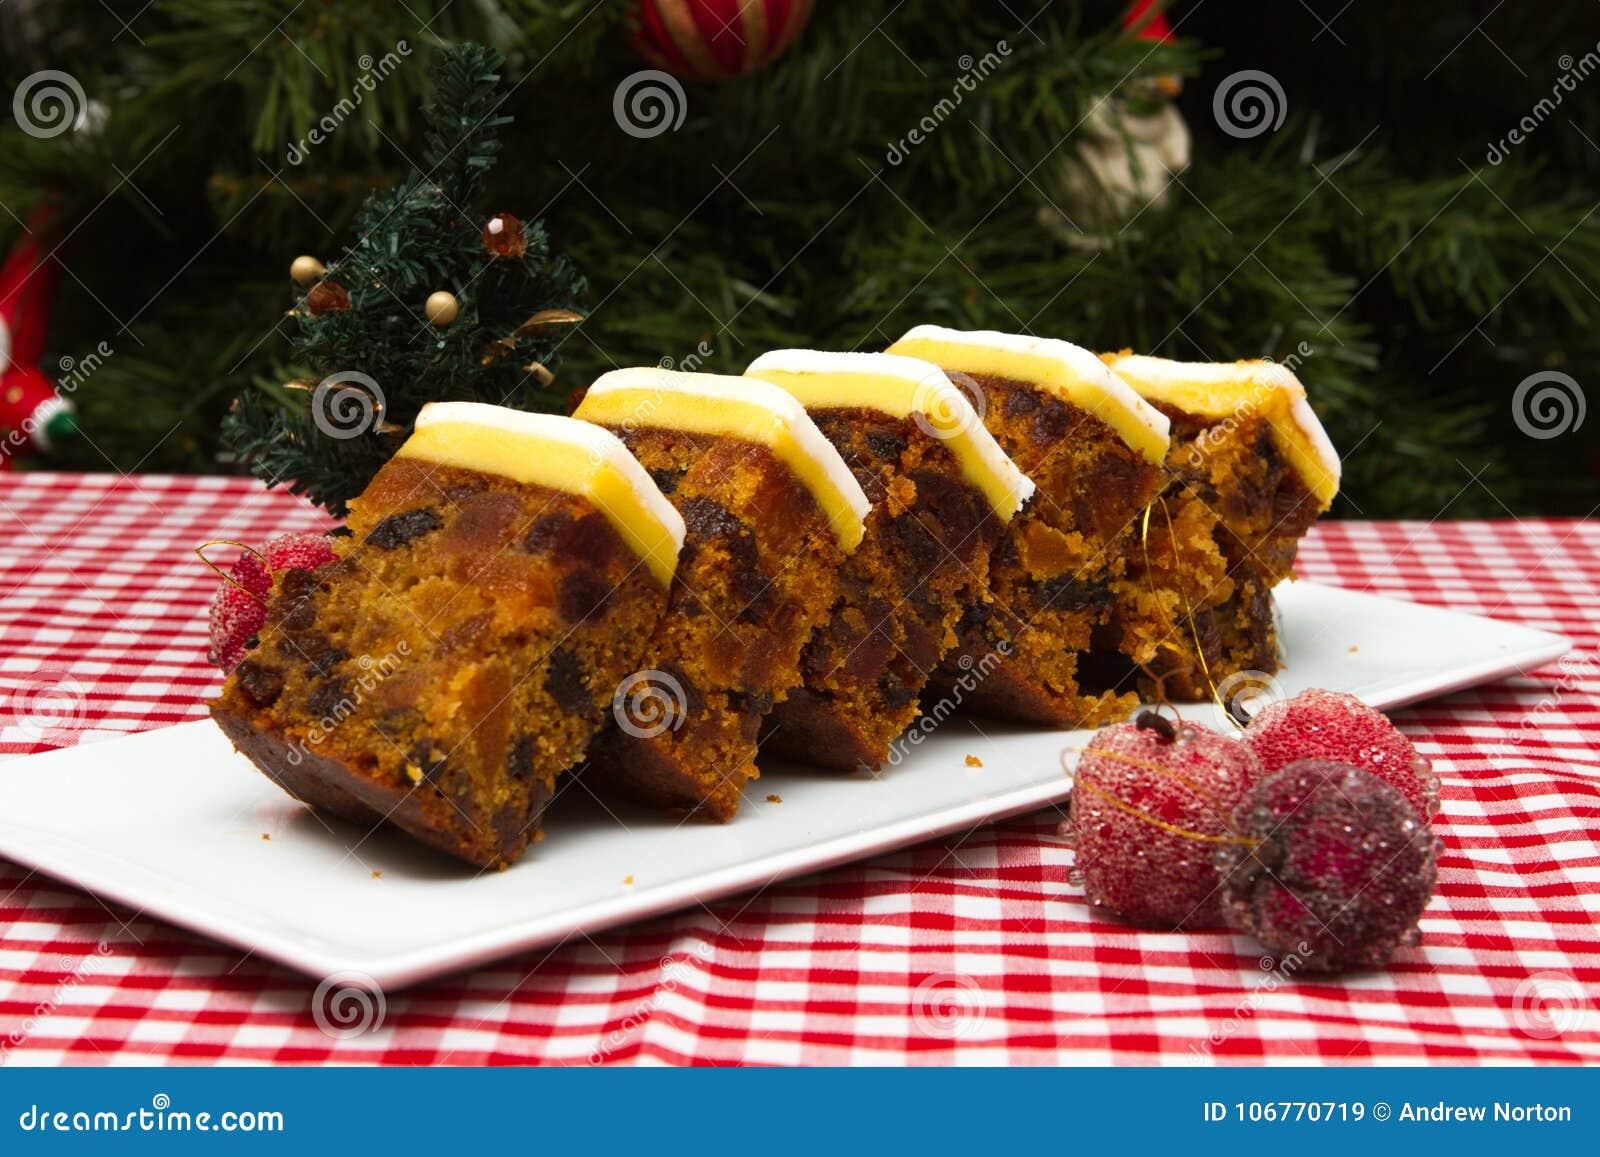 Christmas Tree Fruit Platter.Image Of Christmas Tree Fruit Trays Christmas Tree Fruit